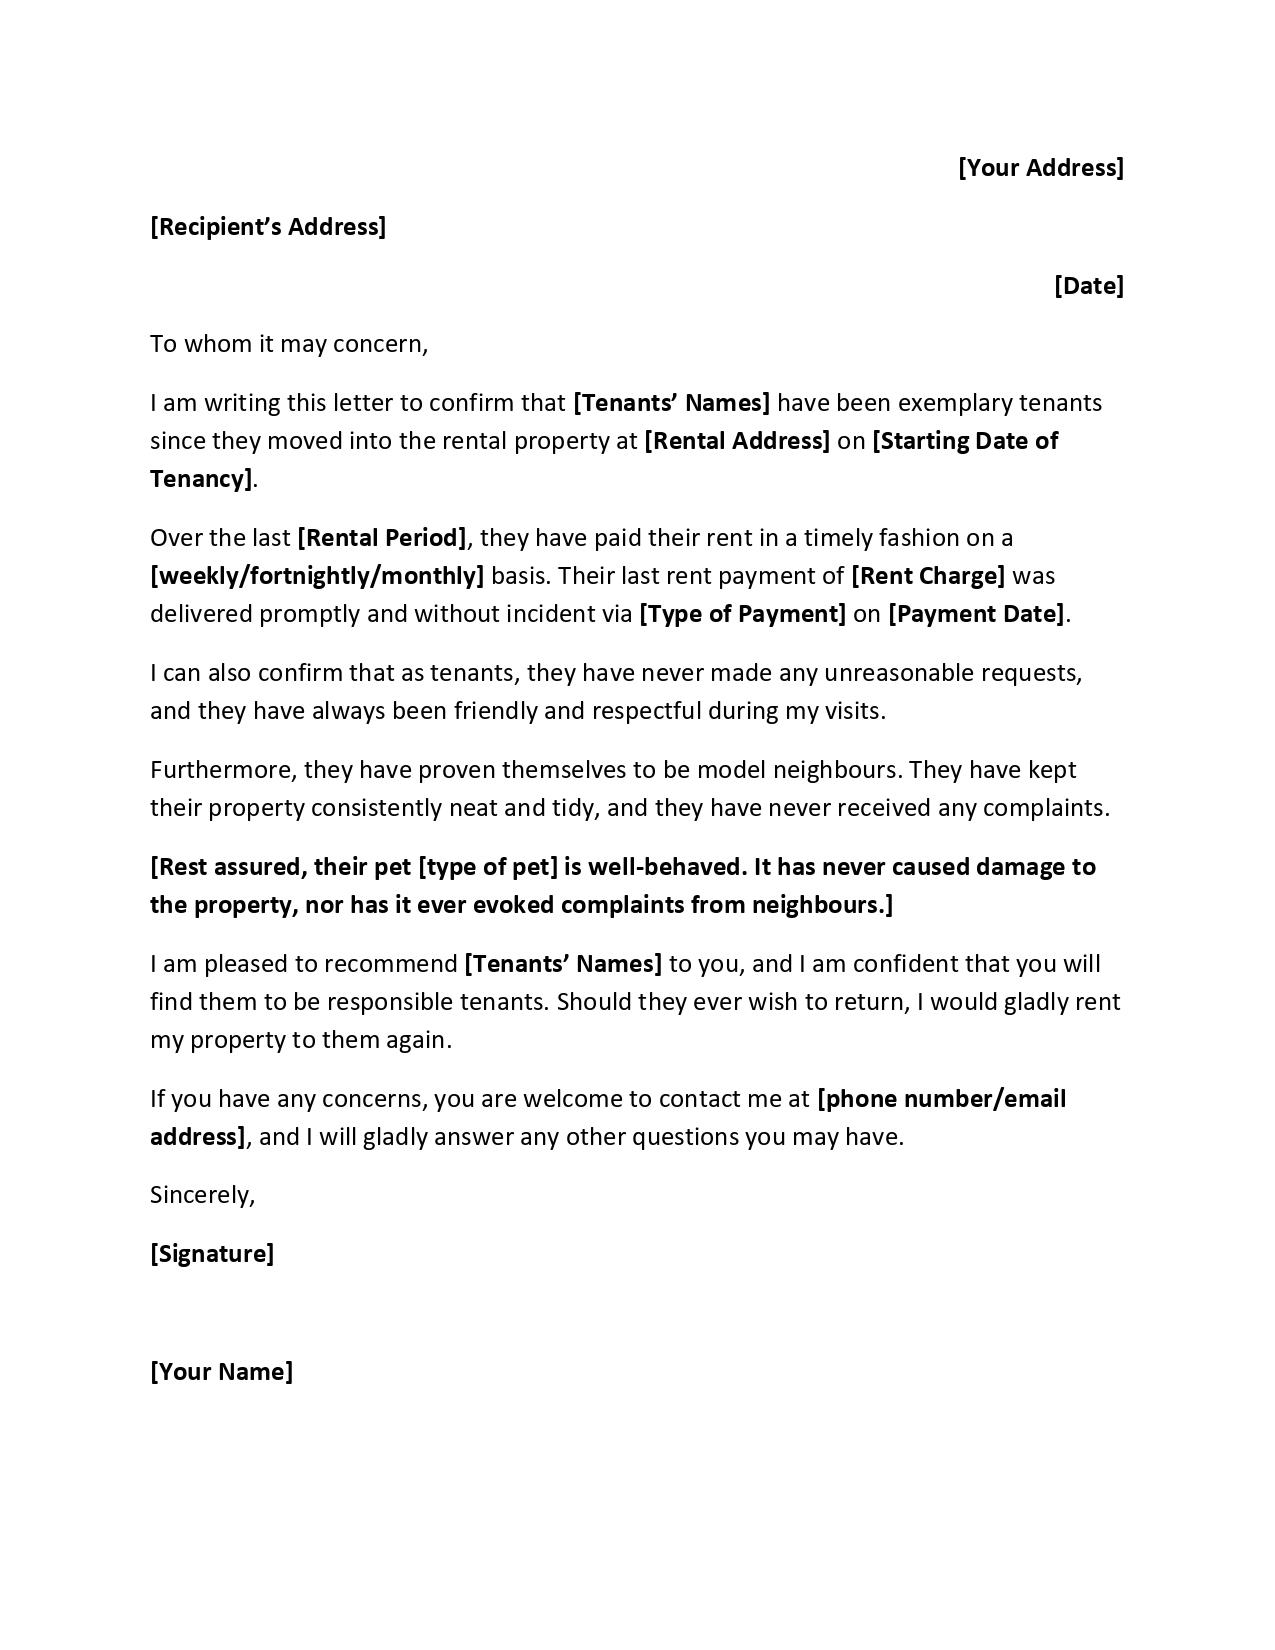 Letter Of Recommendation Tenant from www.geneevarojr.com